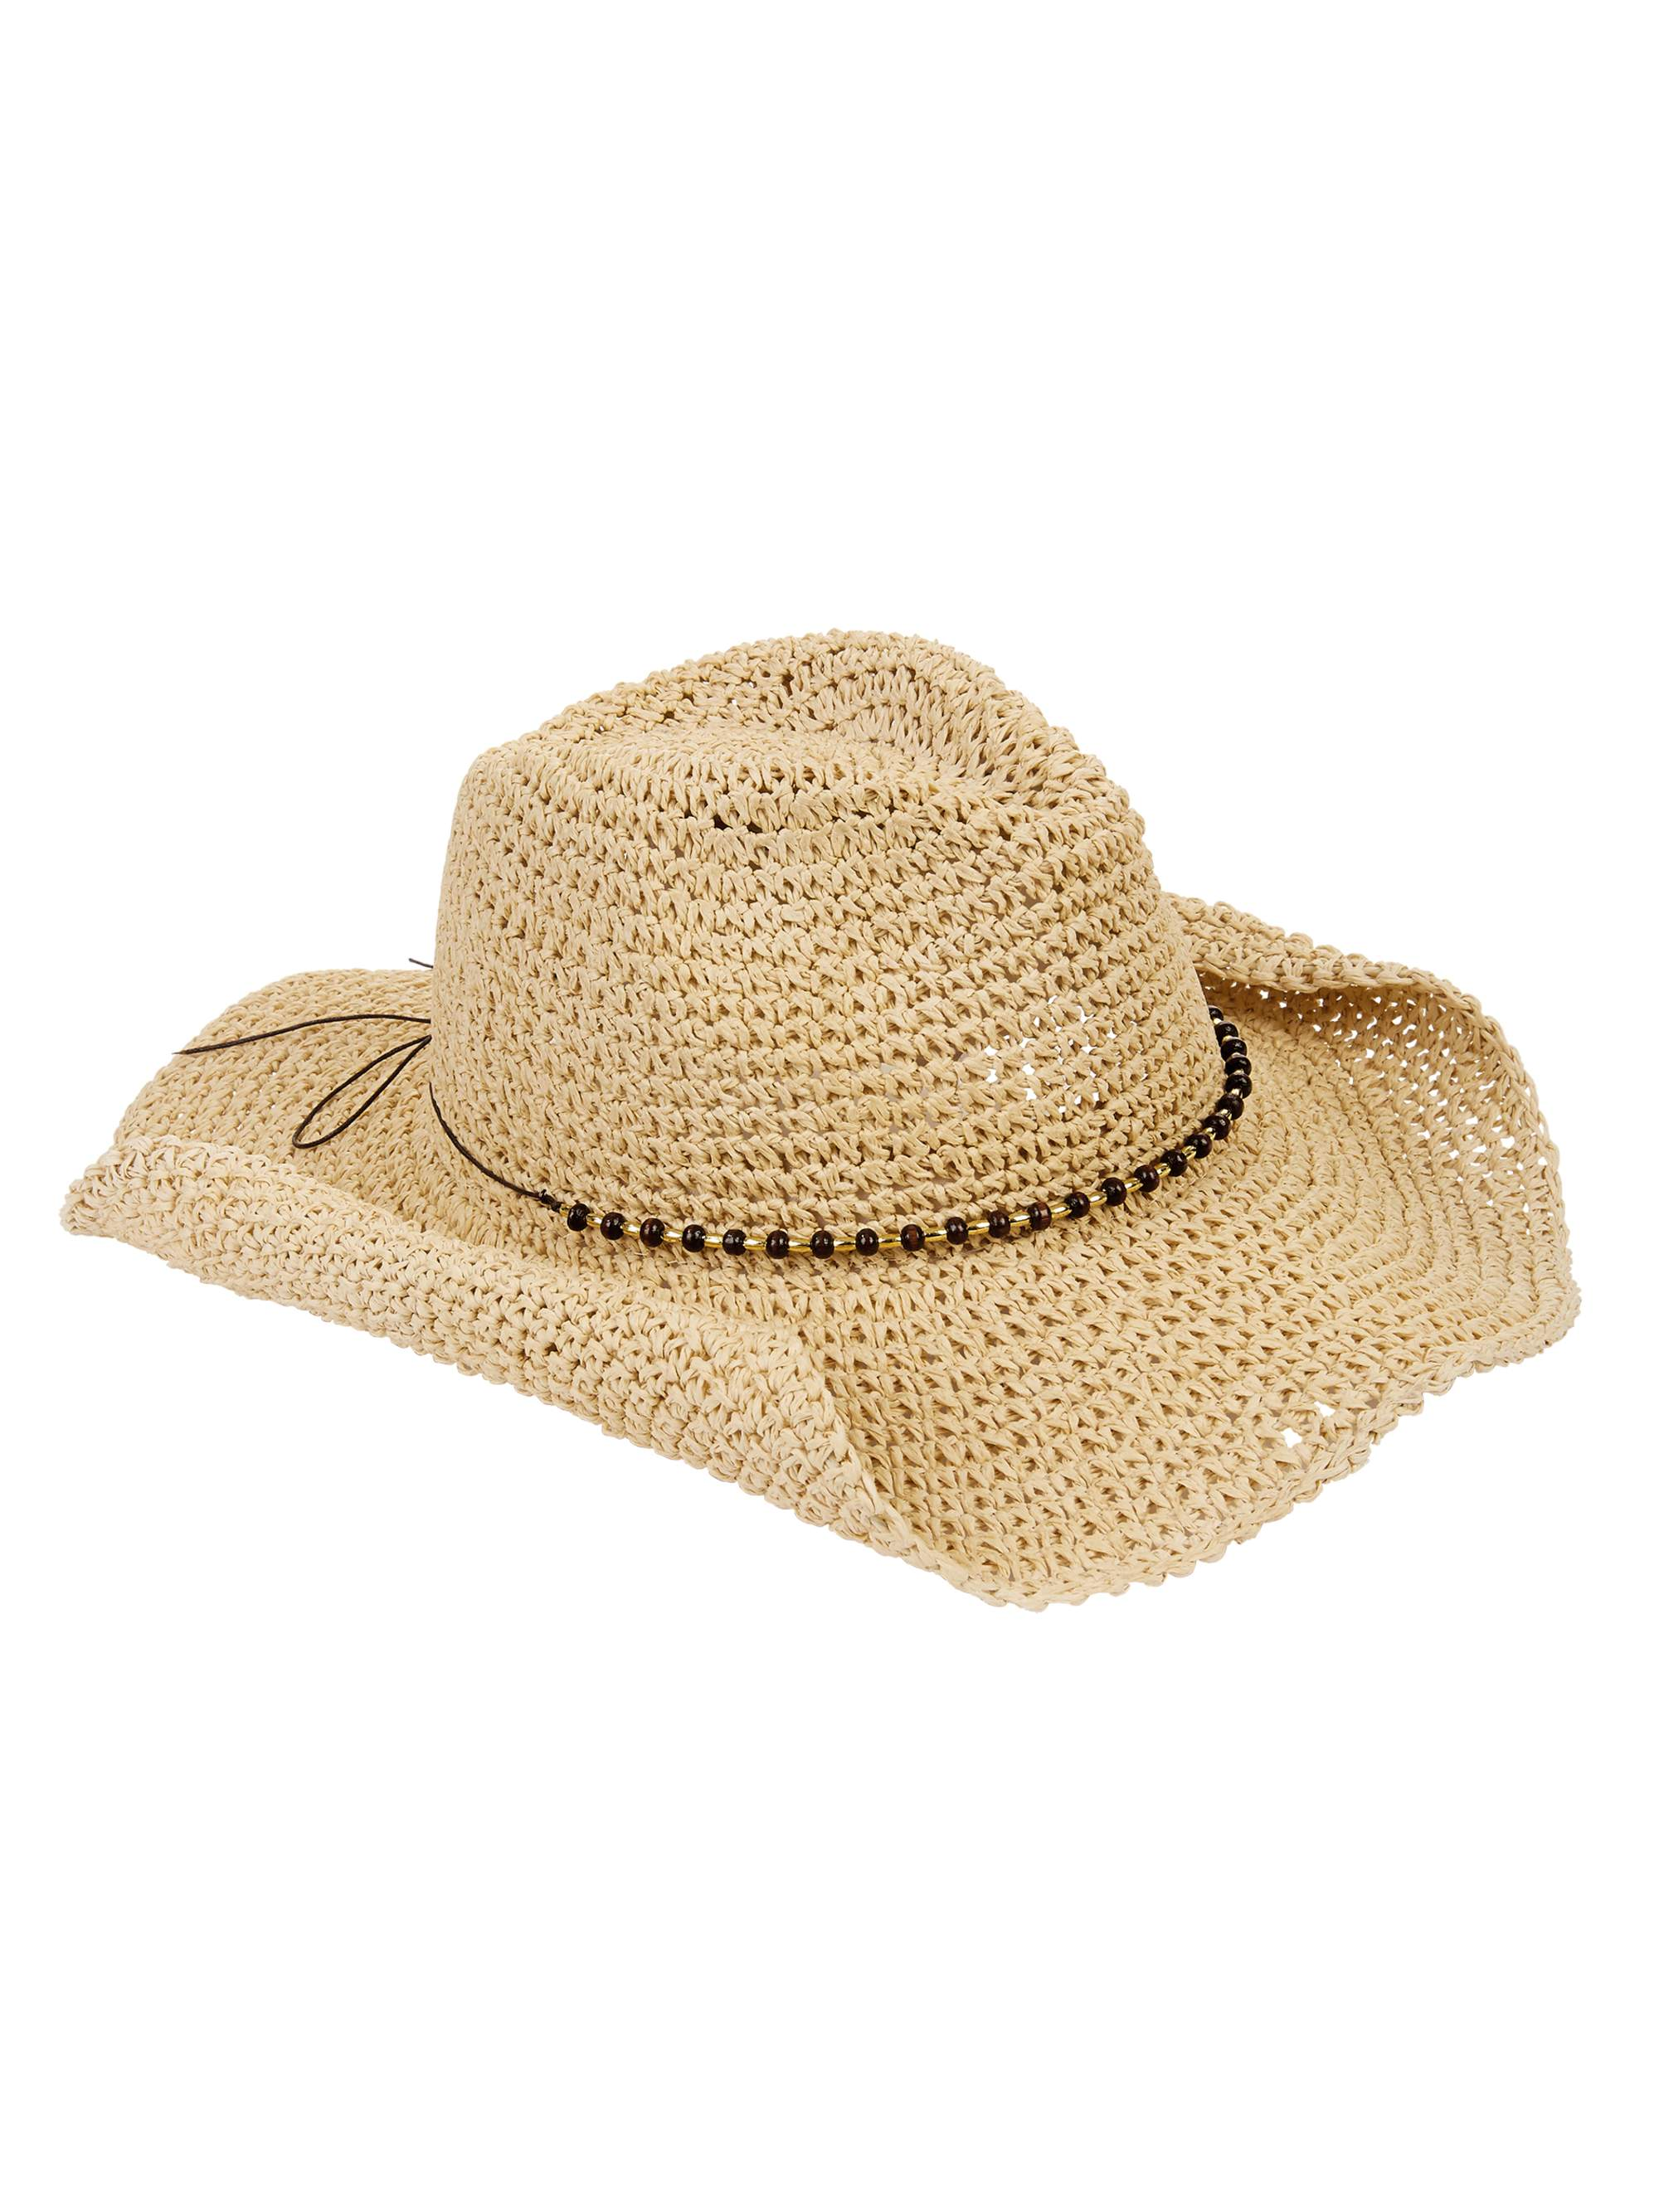 Eliza May Rose Women's Cowboy Hat